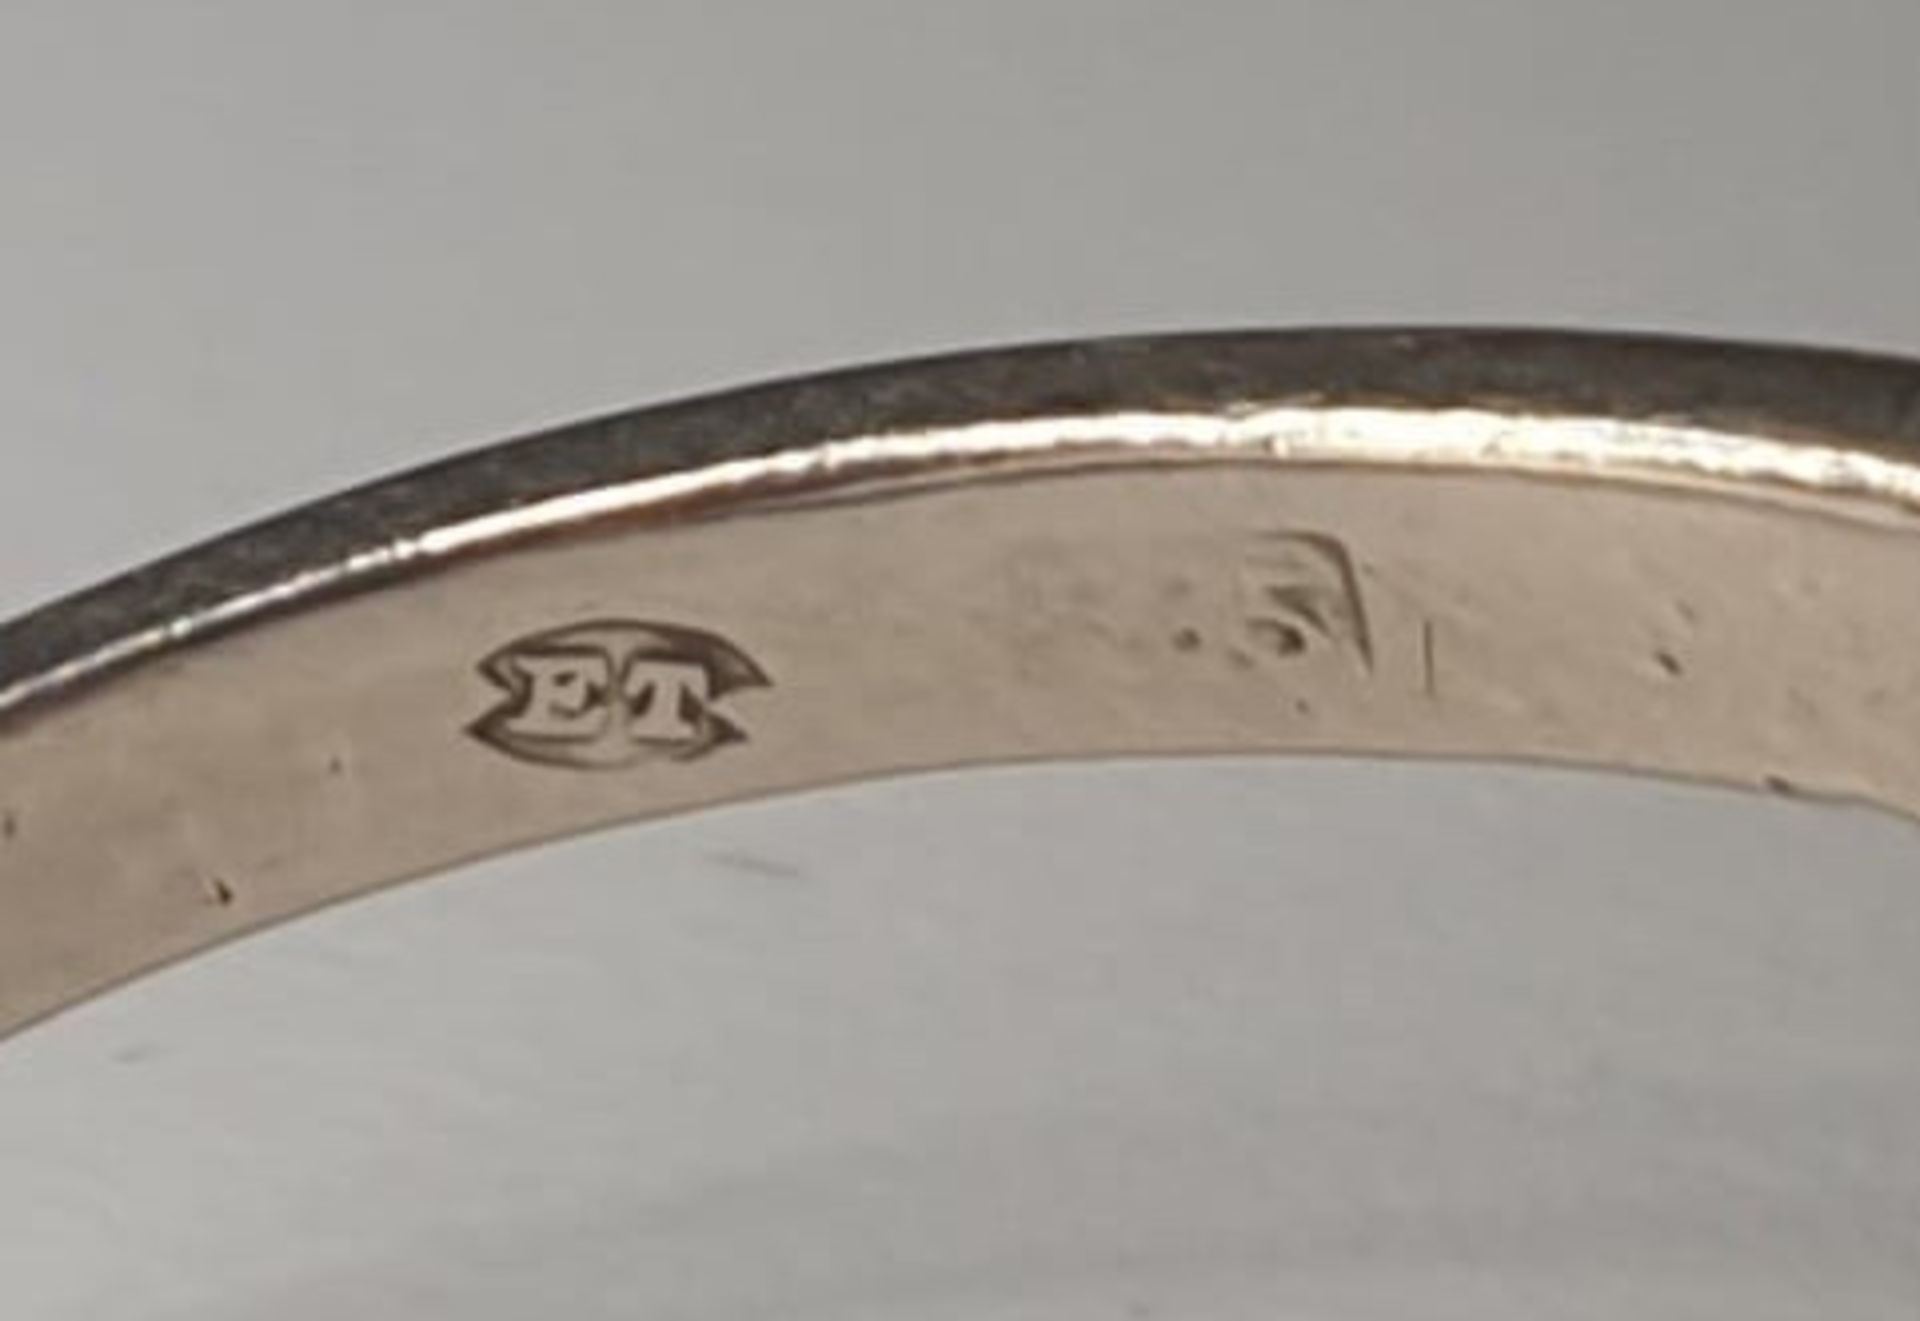 Akoya Pearls   Diamond   14K Gold - Image 3 of 5